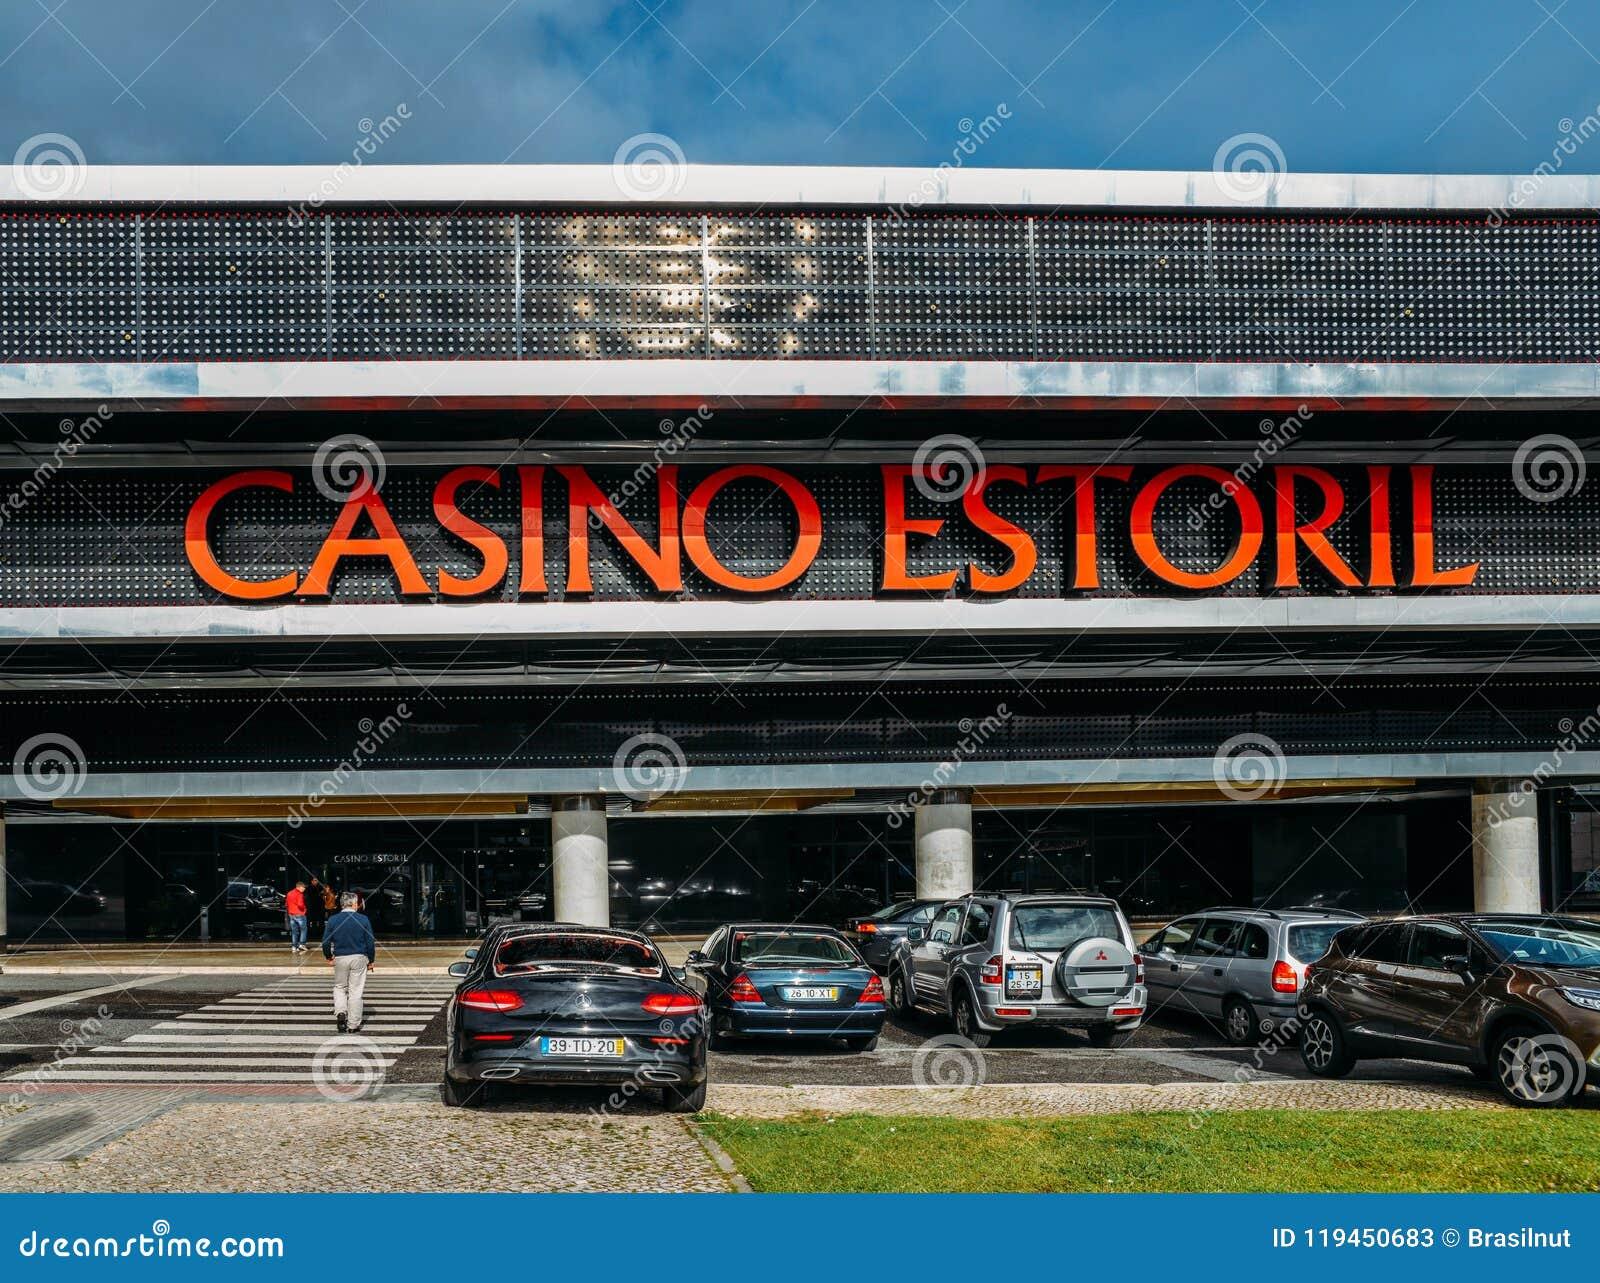 top casinos in europe